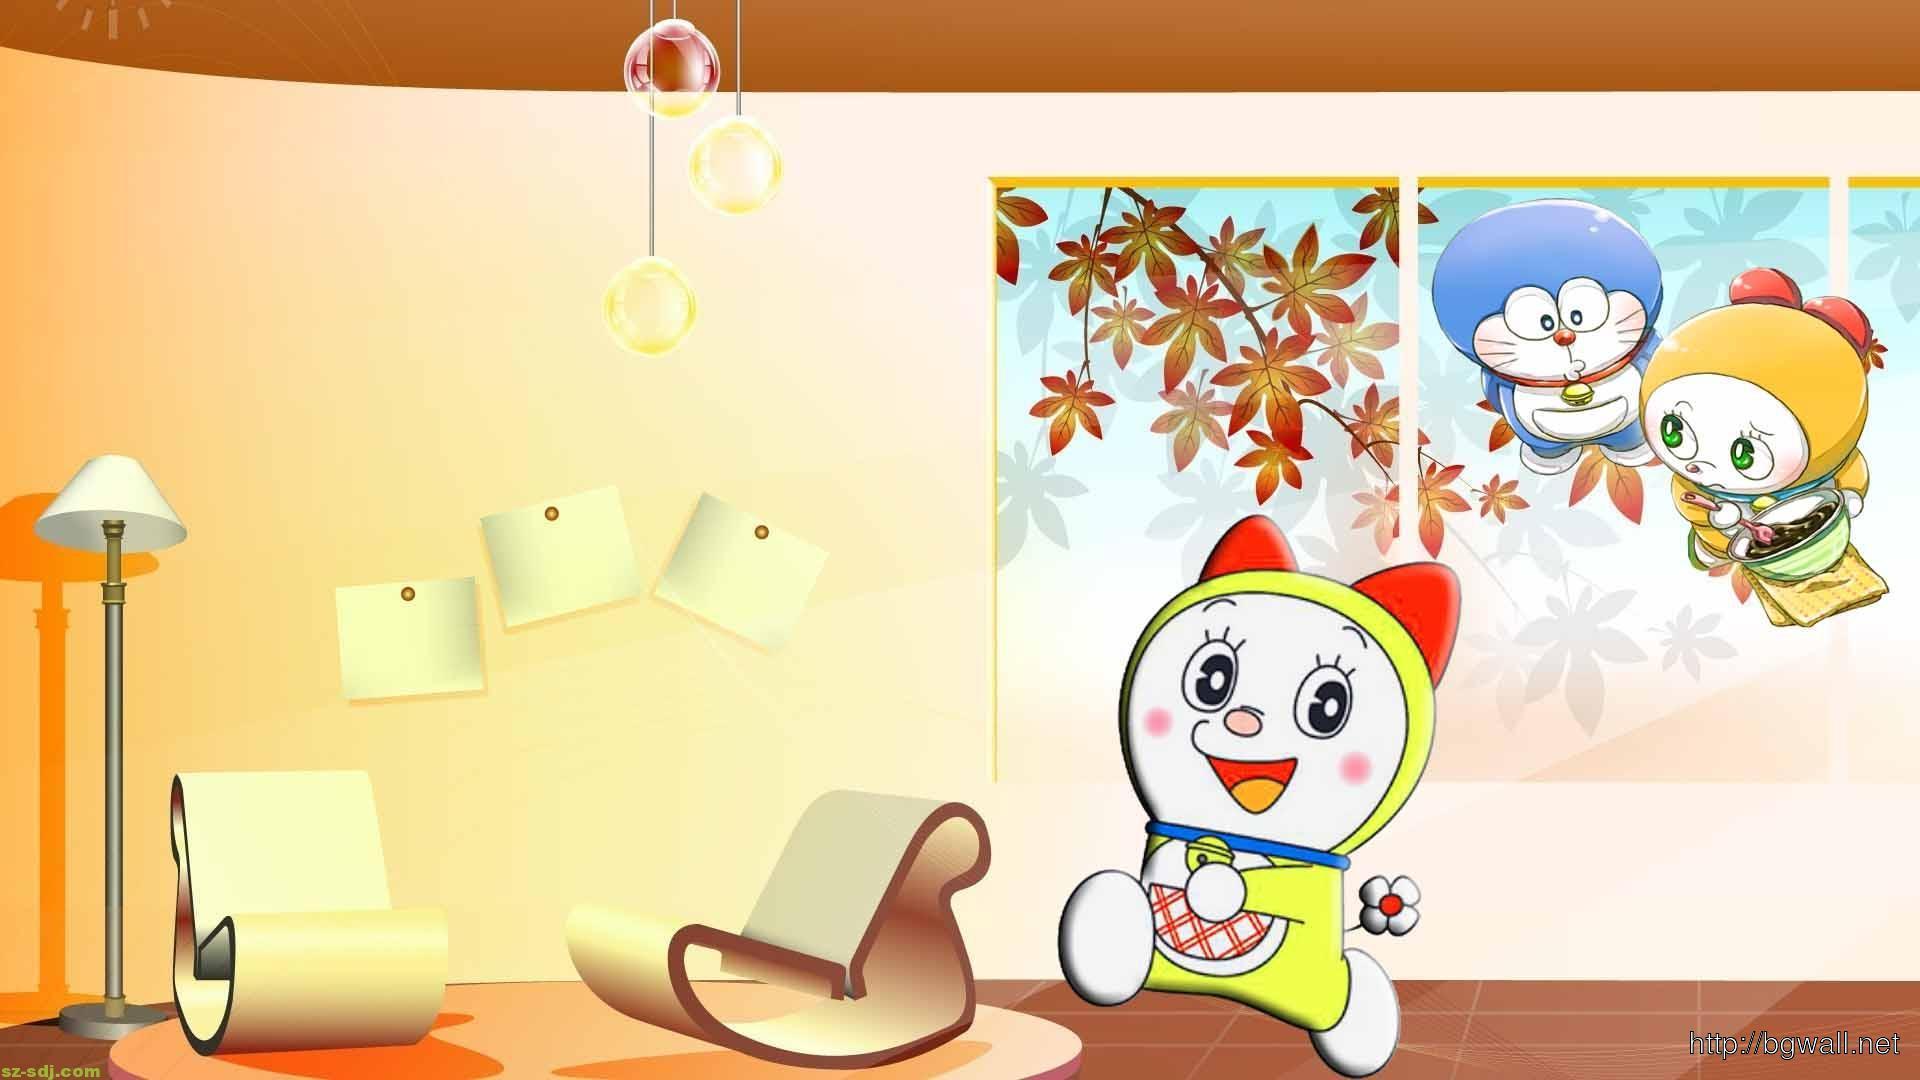 dorami-cartoon-image-wallpaper